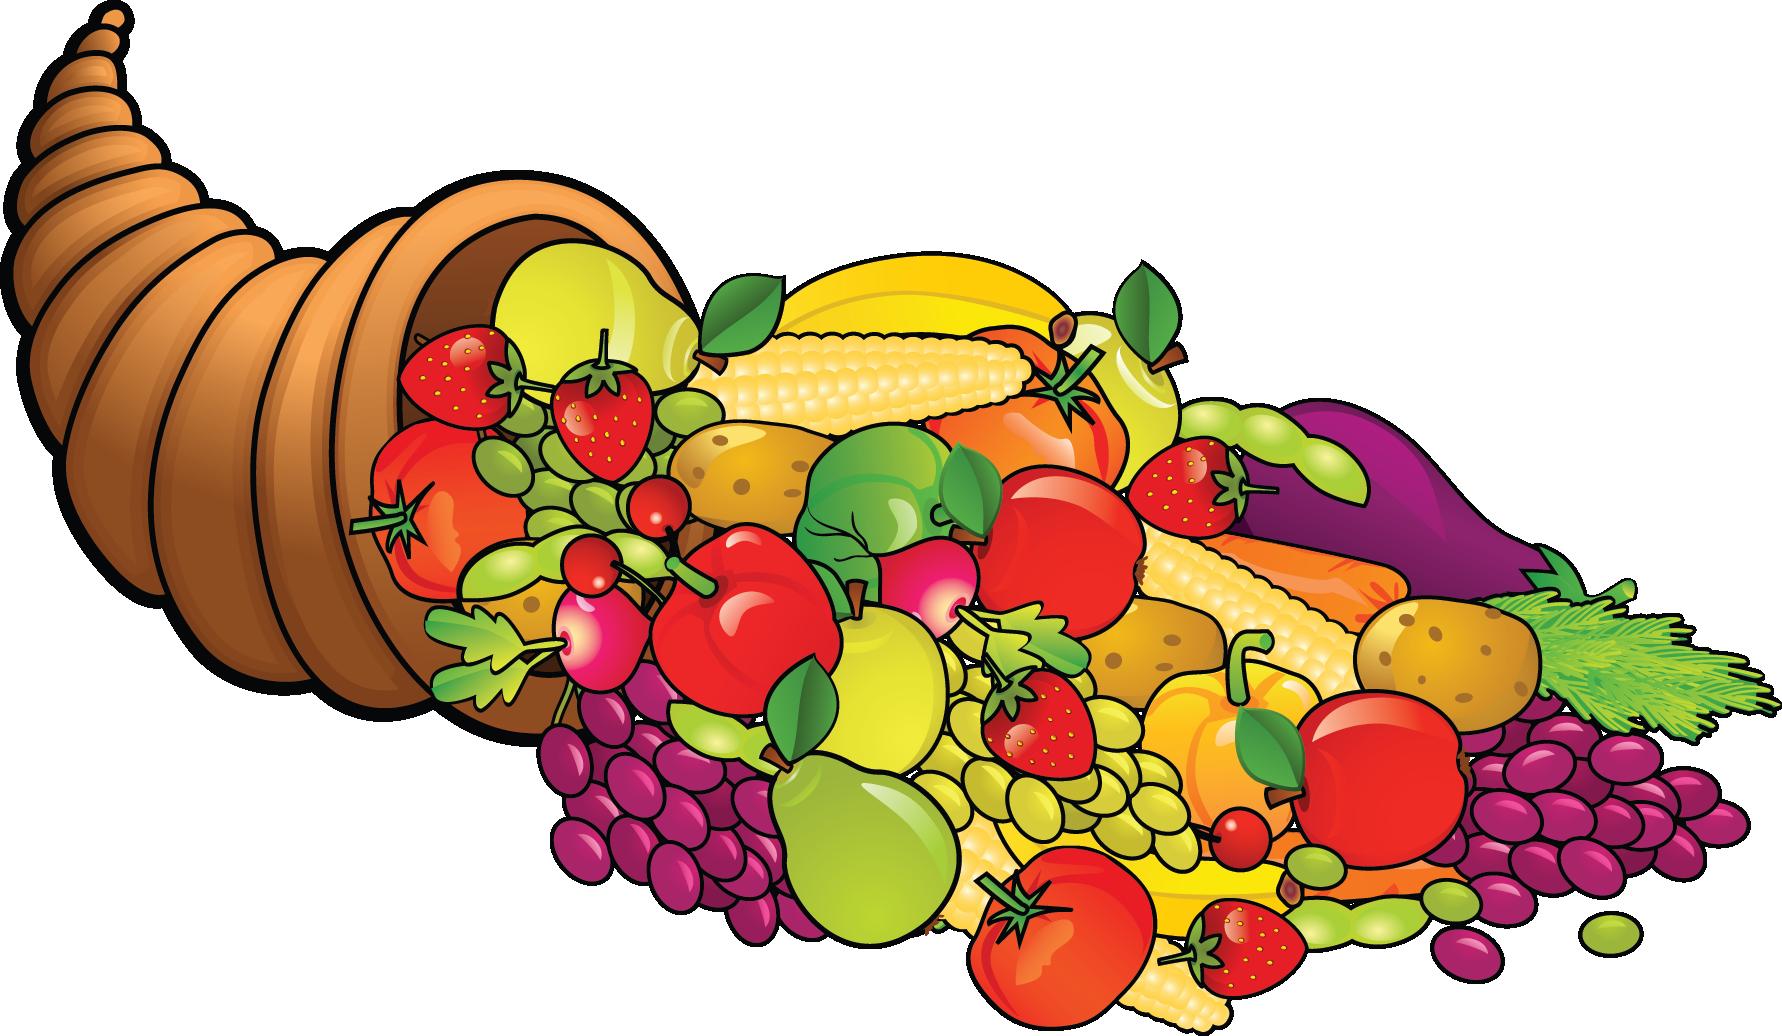 Thanksgiving Food Clip Art November Imag-thanksgiving food clip art november images-17